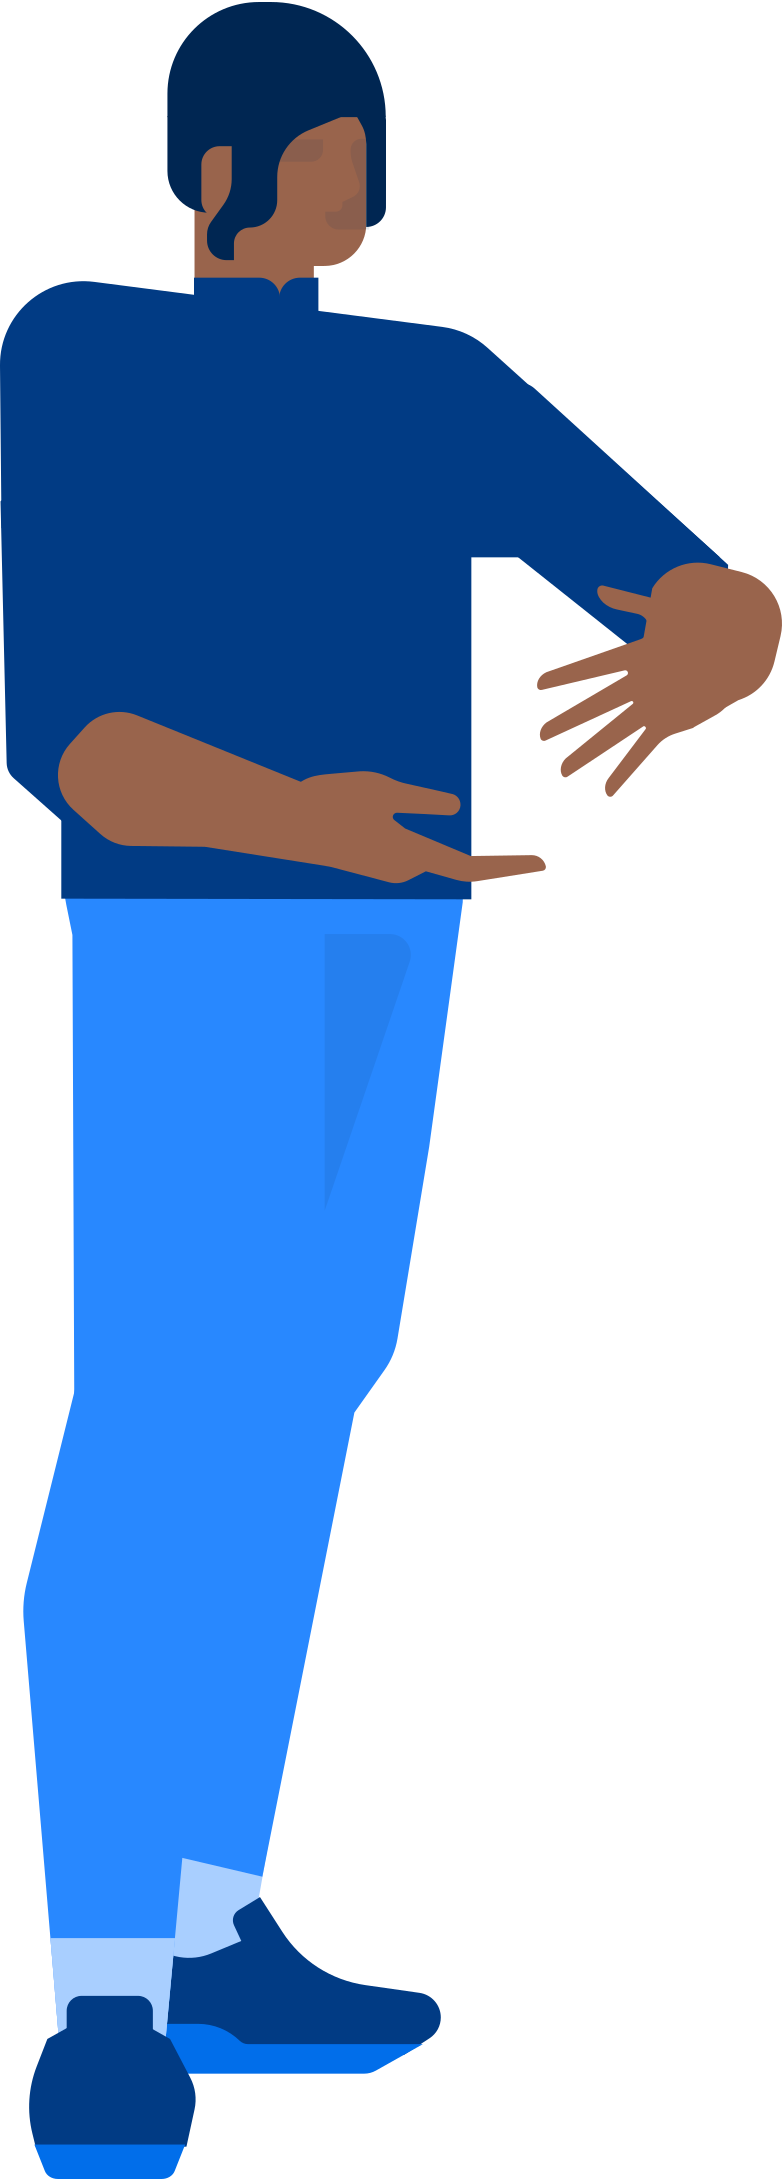 man holding smth Clipart illustration in PNG, SVG